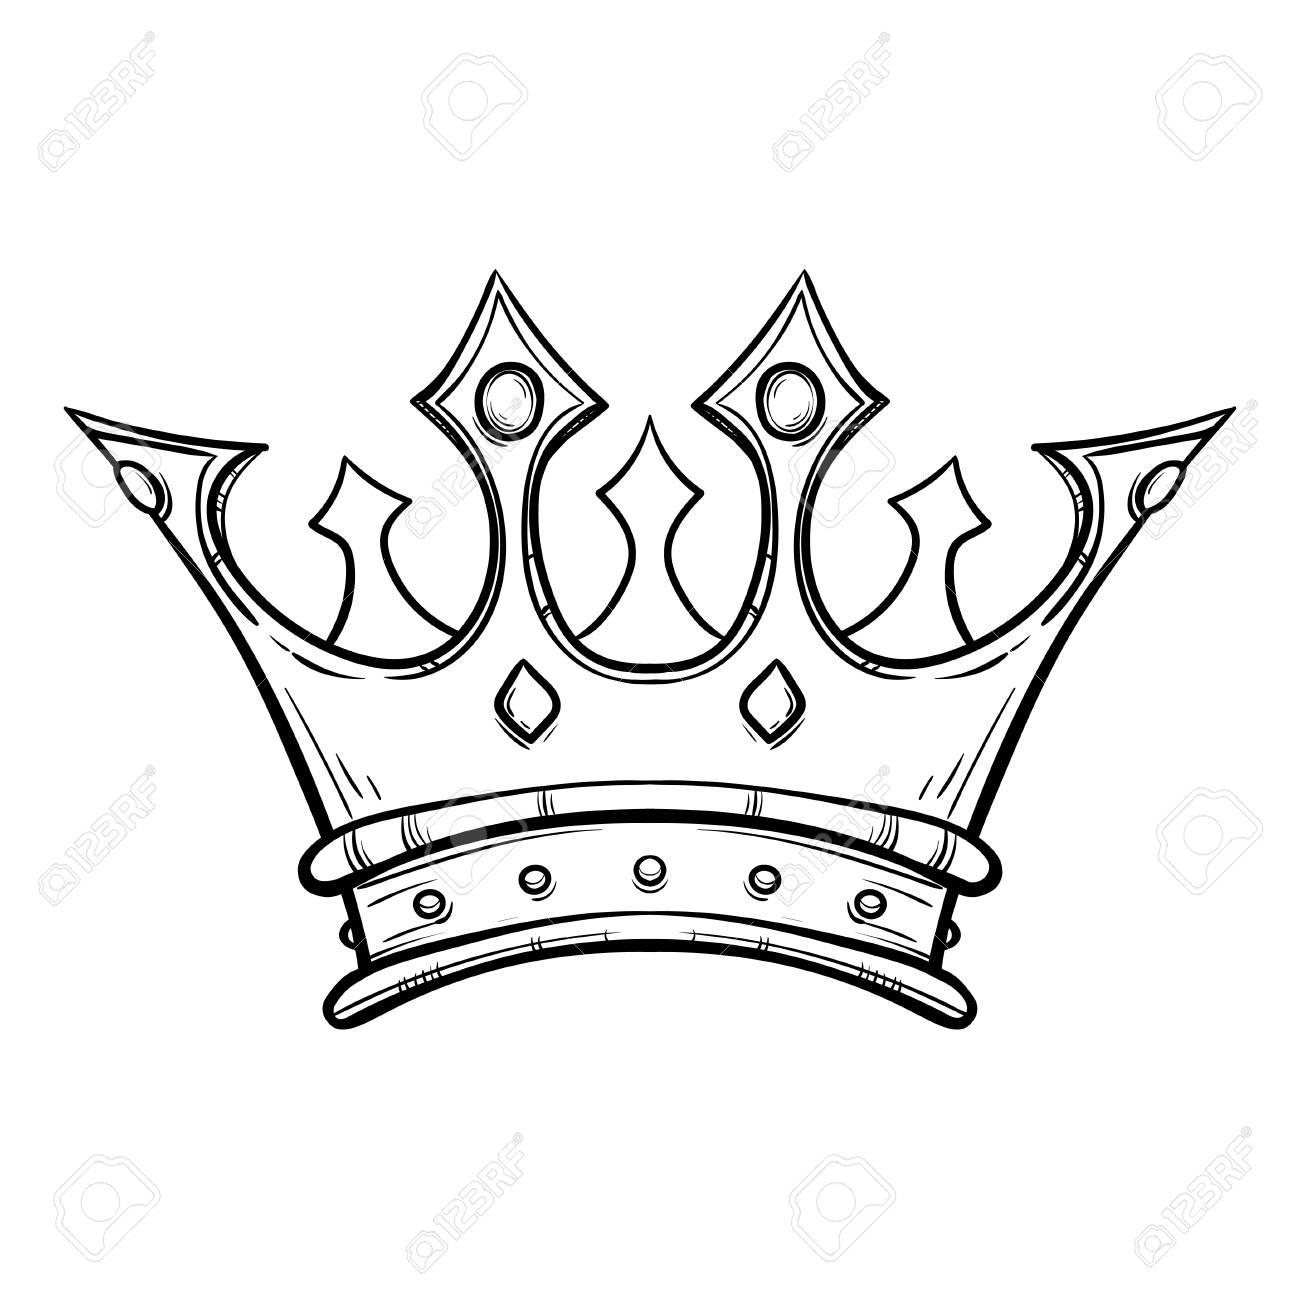 1300x1300 Hand Drawn King Crown Hand Drawn Royalty Free Cliparts, Vectors